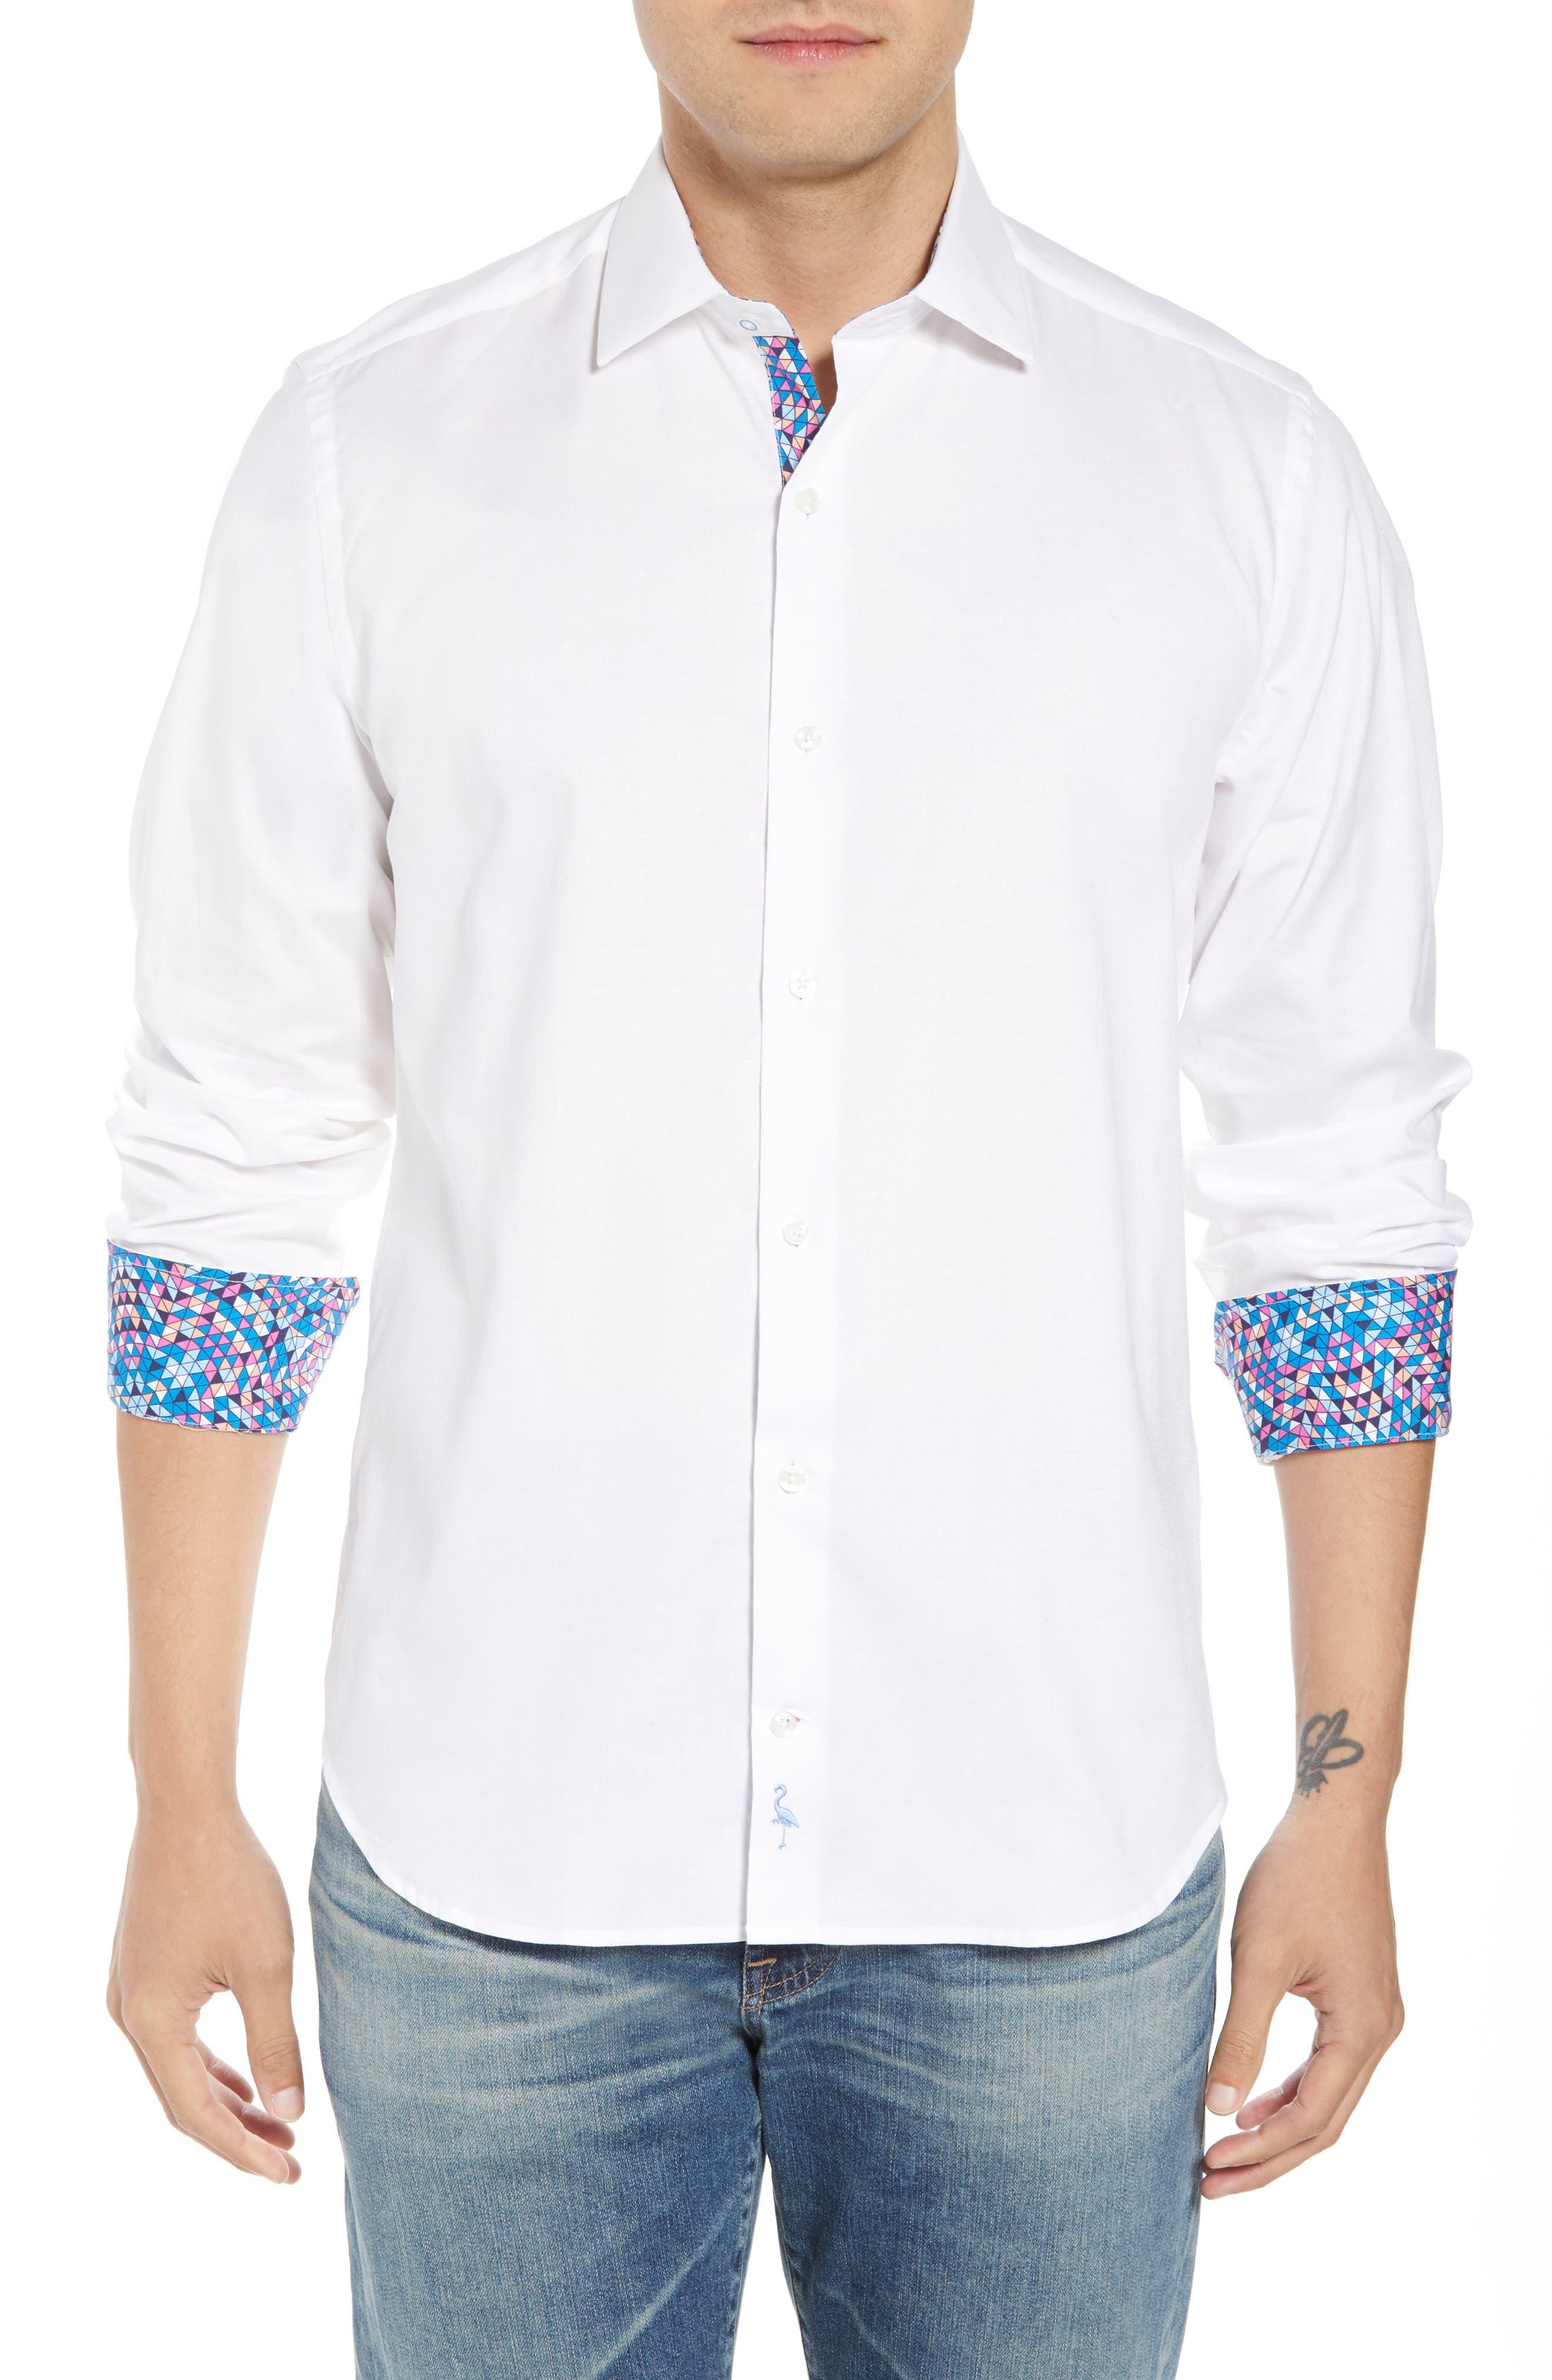 Angelo Regular Fit Sport Shirt,                             Main thumbnail 1, color,                             White